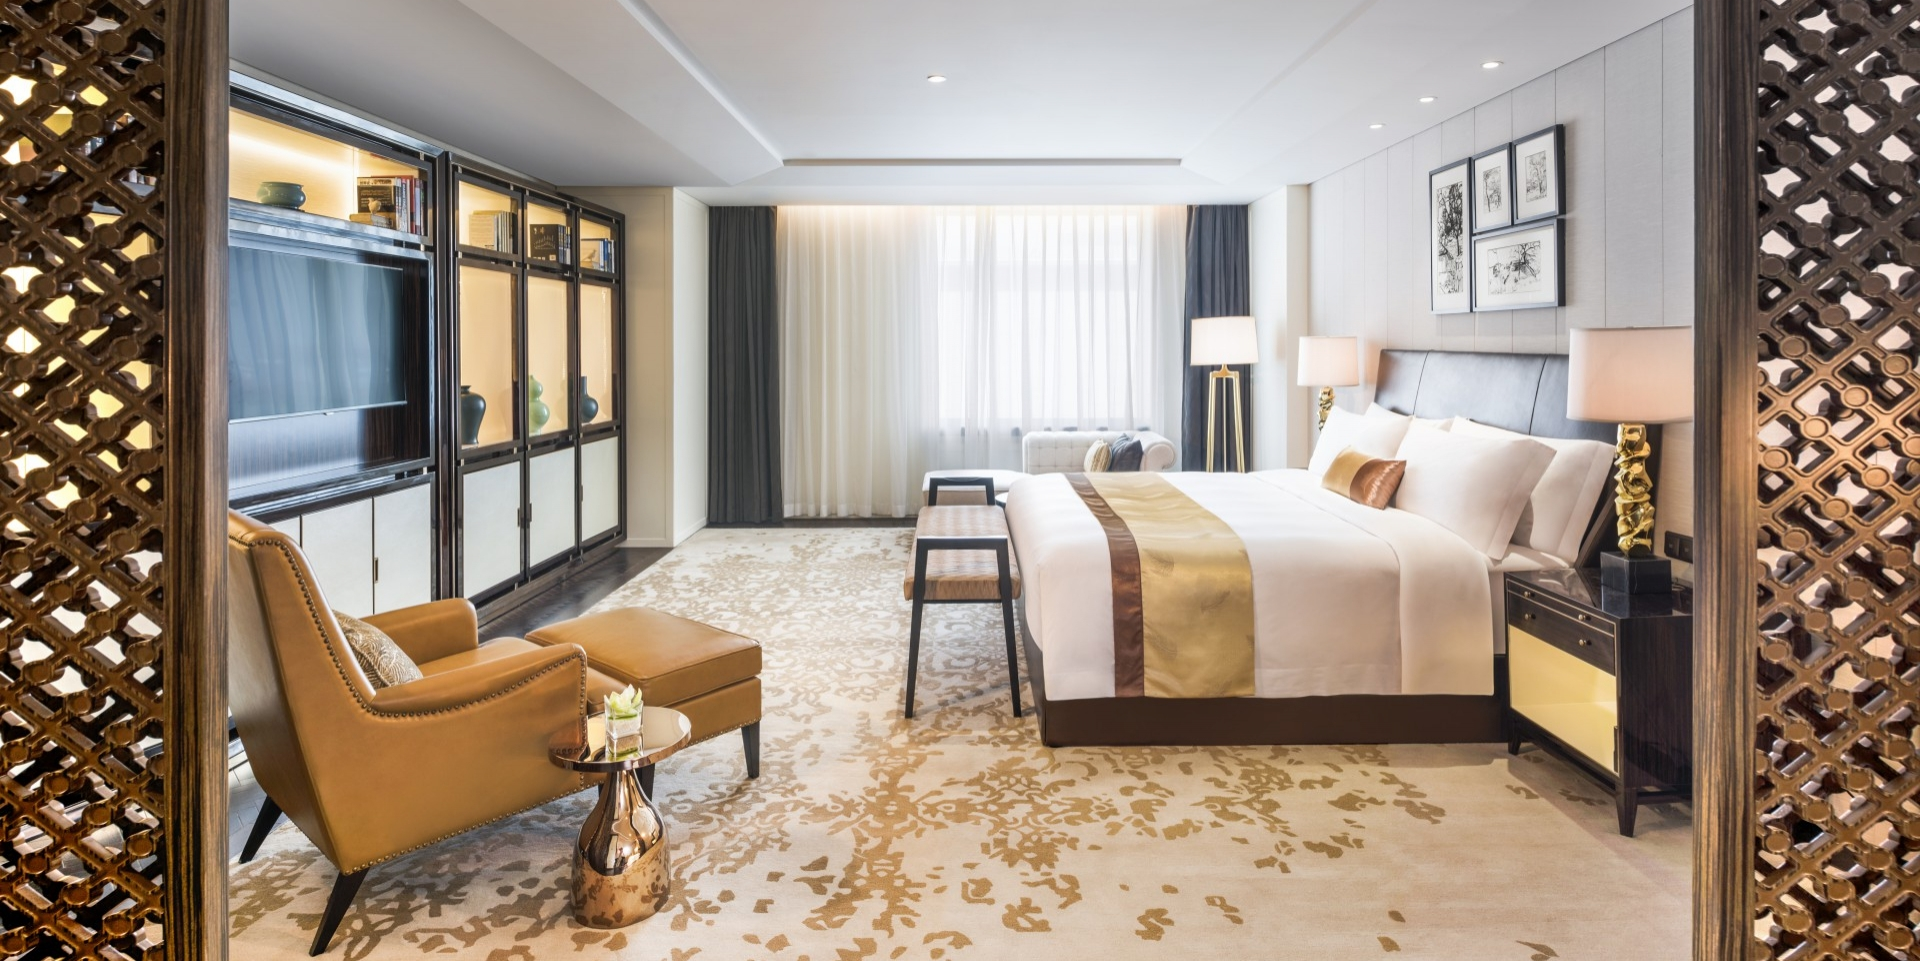 Hirsch Bedner Associates An Experience in Hospitality Interior Design 4